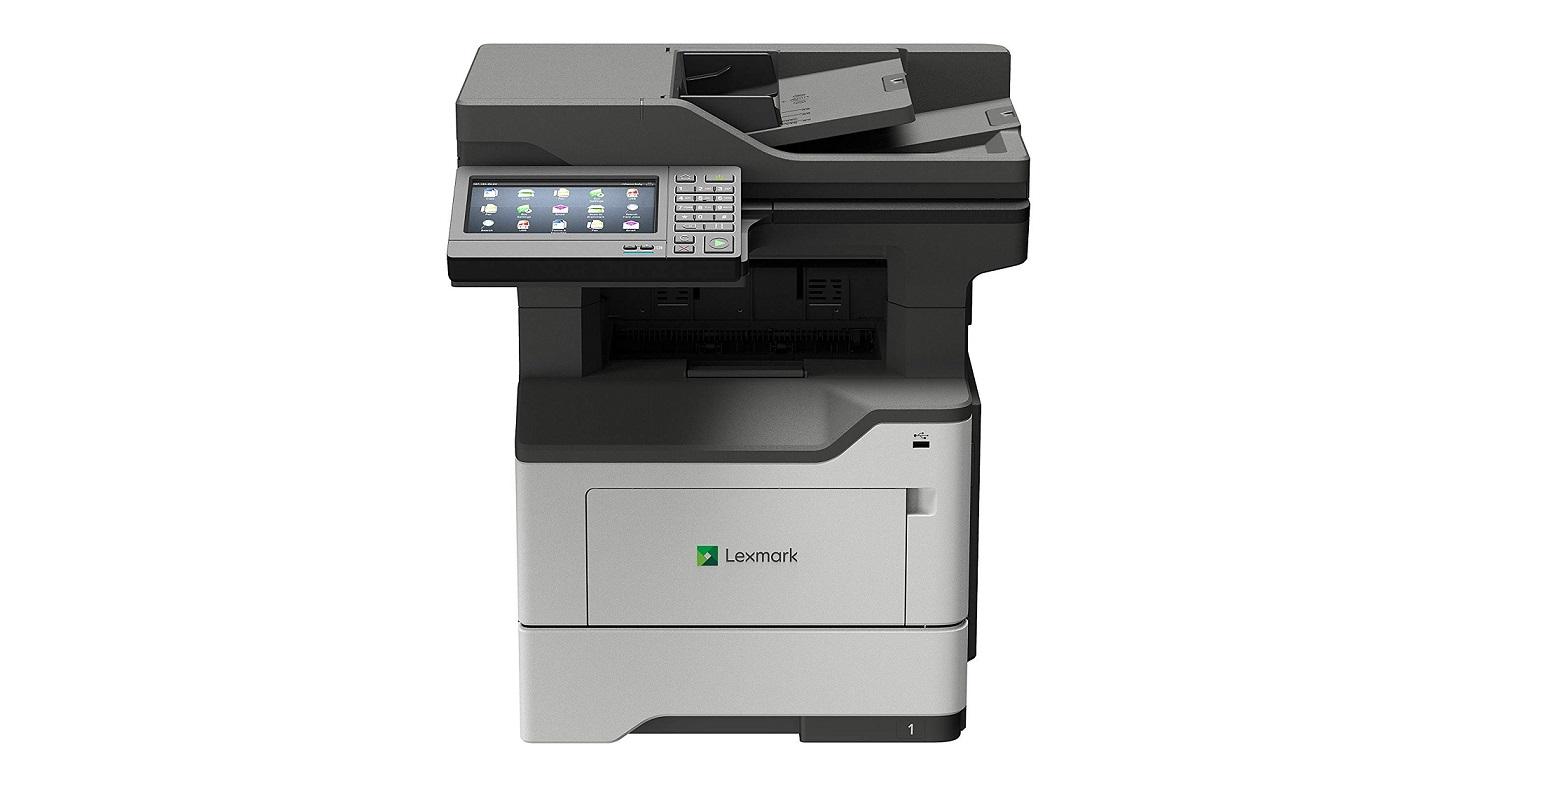 Lexmark 36S0900 MX622ade Mono 50ppm LAN USB Laser Printer